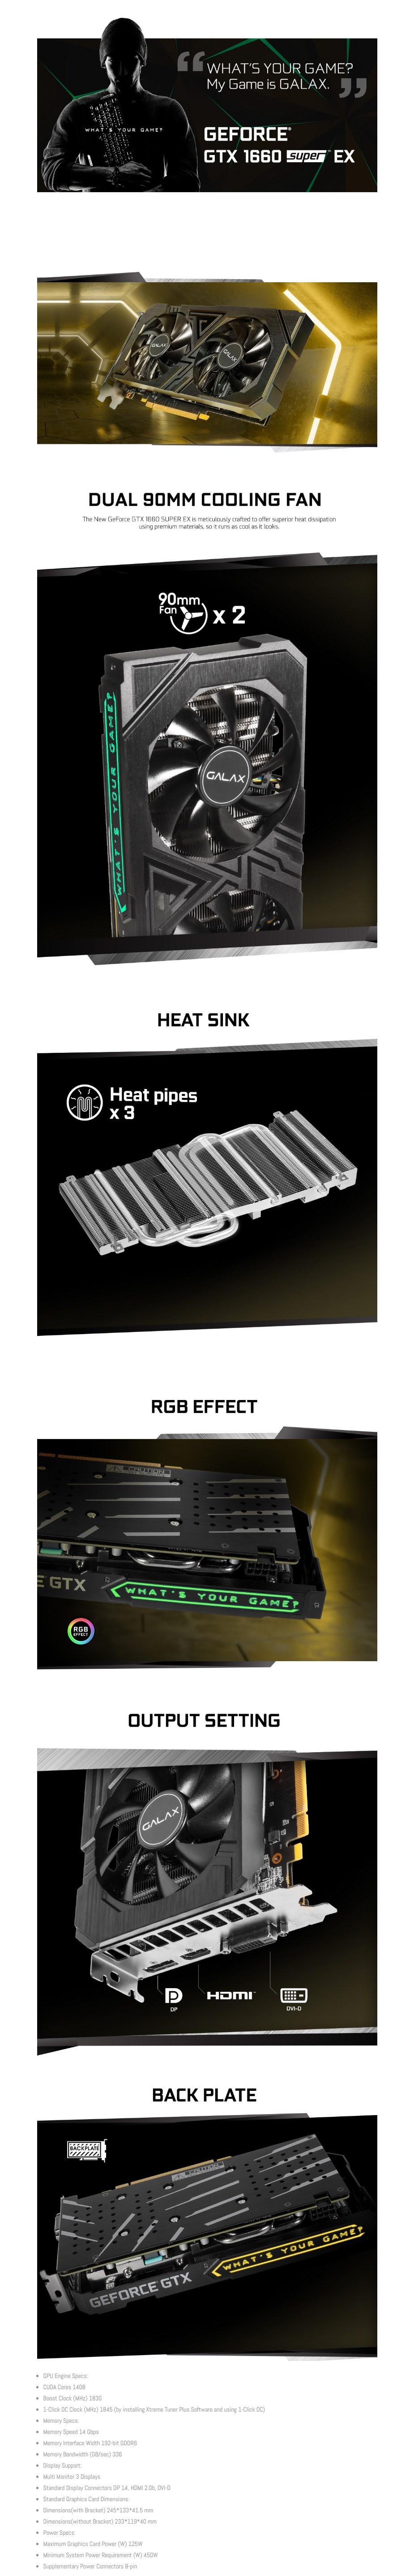 GALAX GeForce GTX 1660 SUPER EX 1-Click OC 6GB Video Card - Overview 1